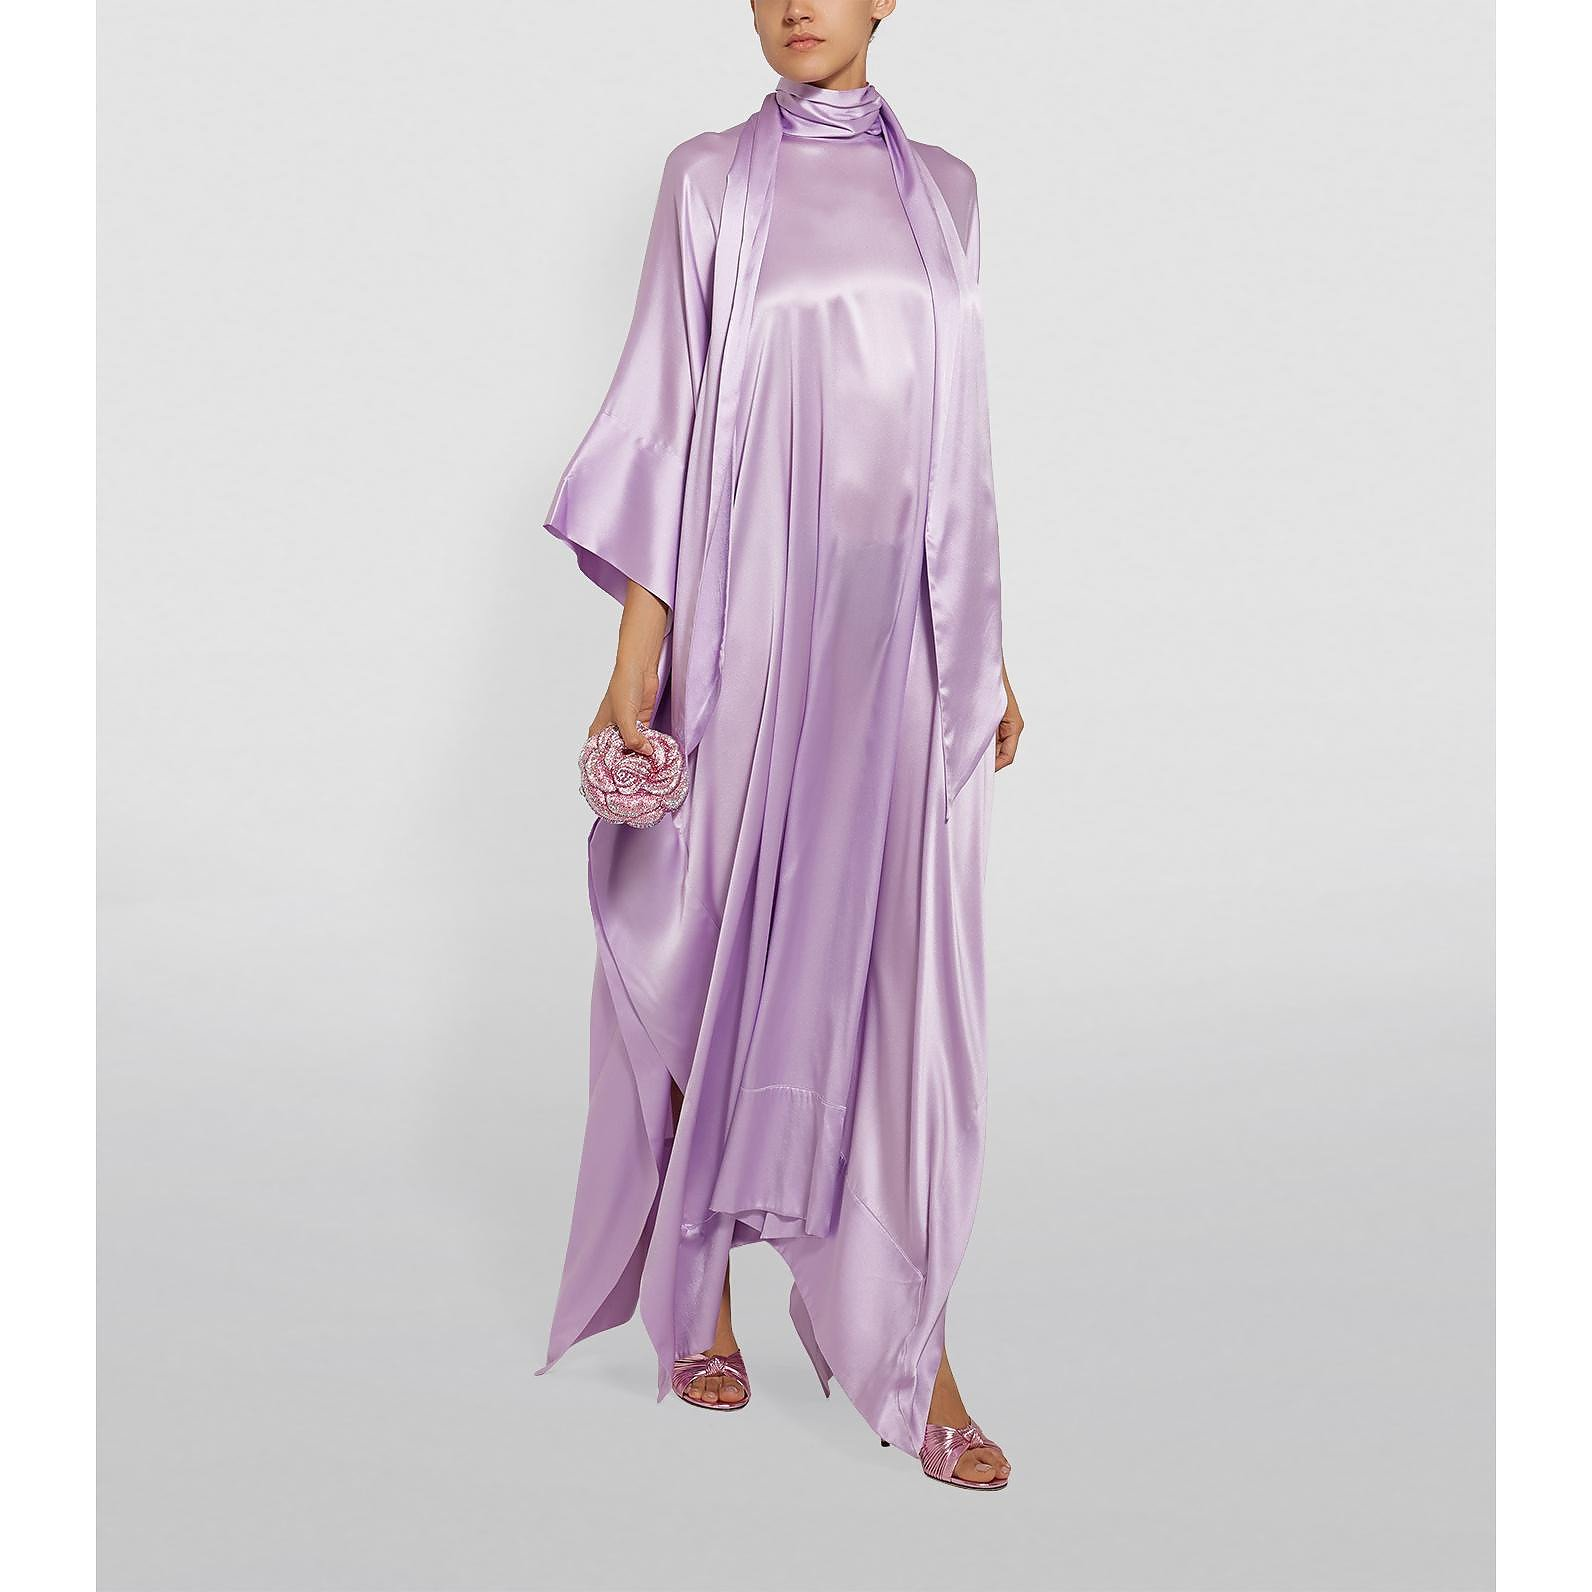 Taller Marmo New Age Kaftan Dress